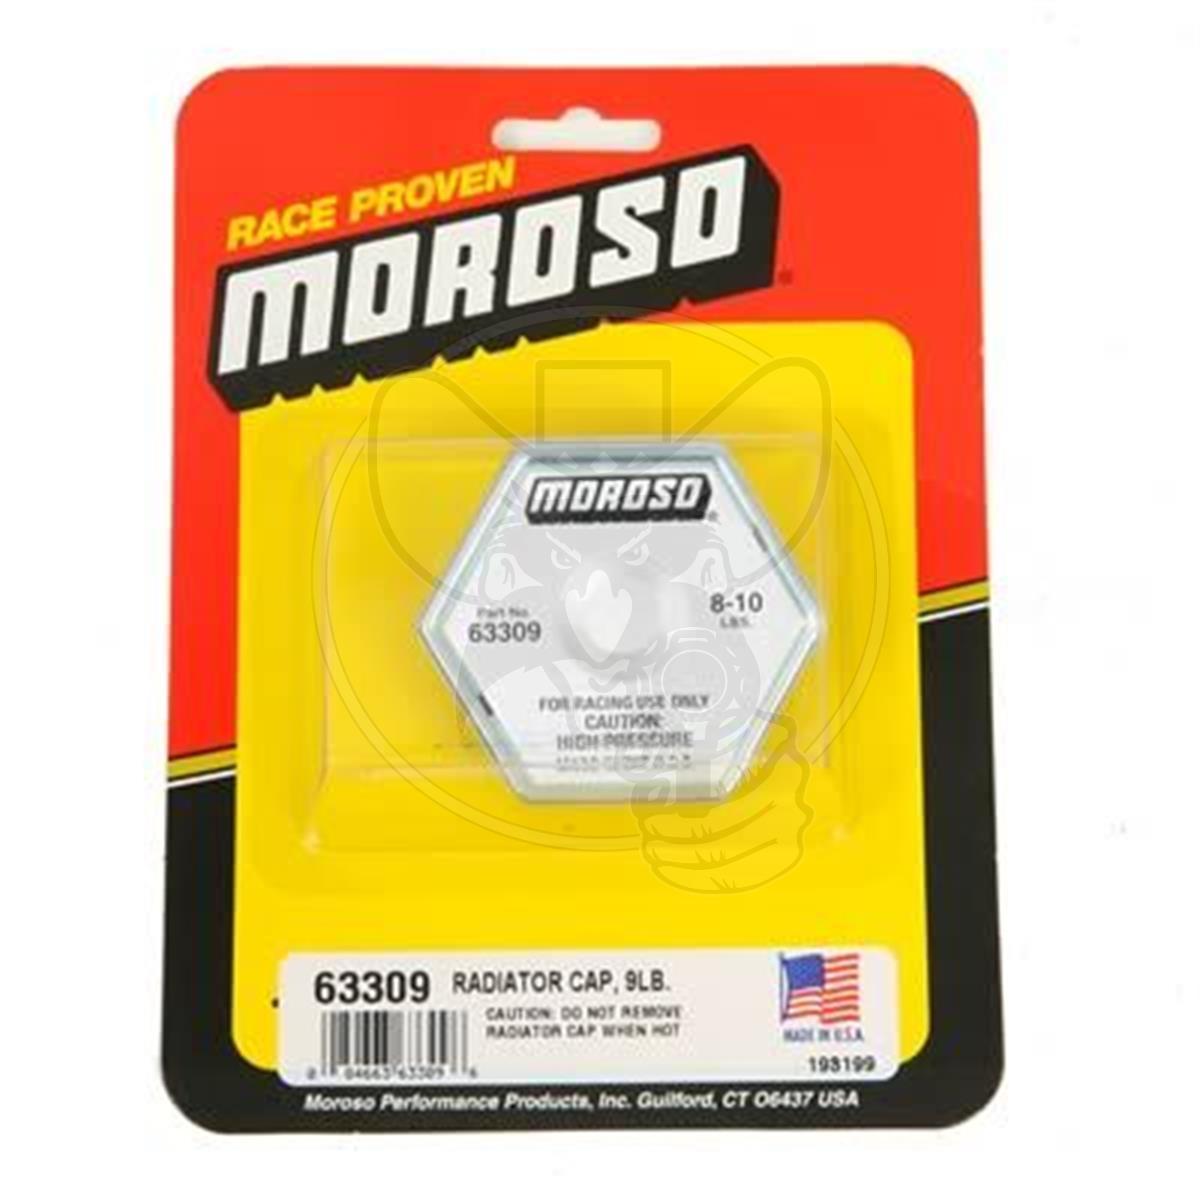 Mo63309 Moroso Radiator Cap Steel Hexagon Moroso Logo 8